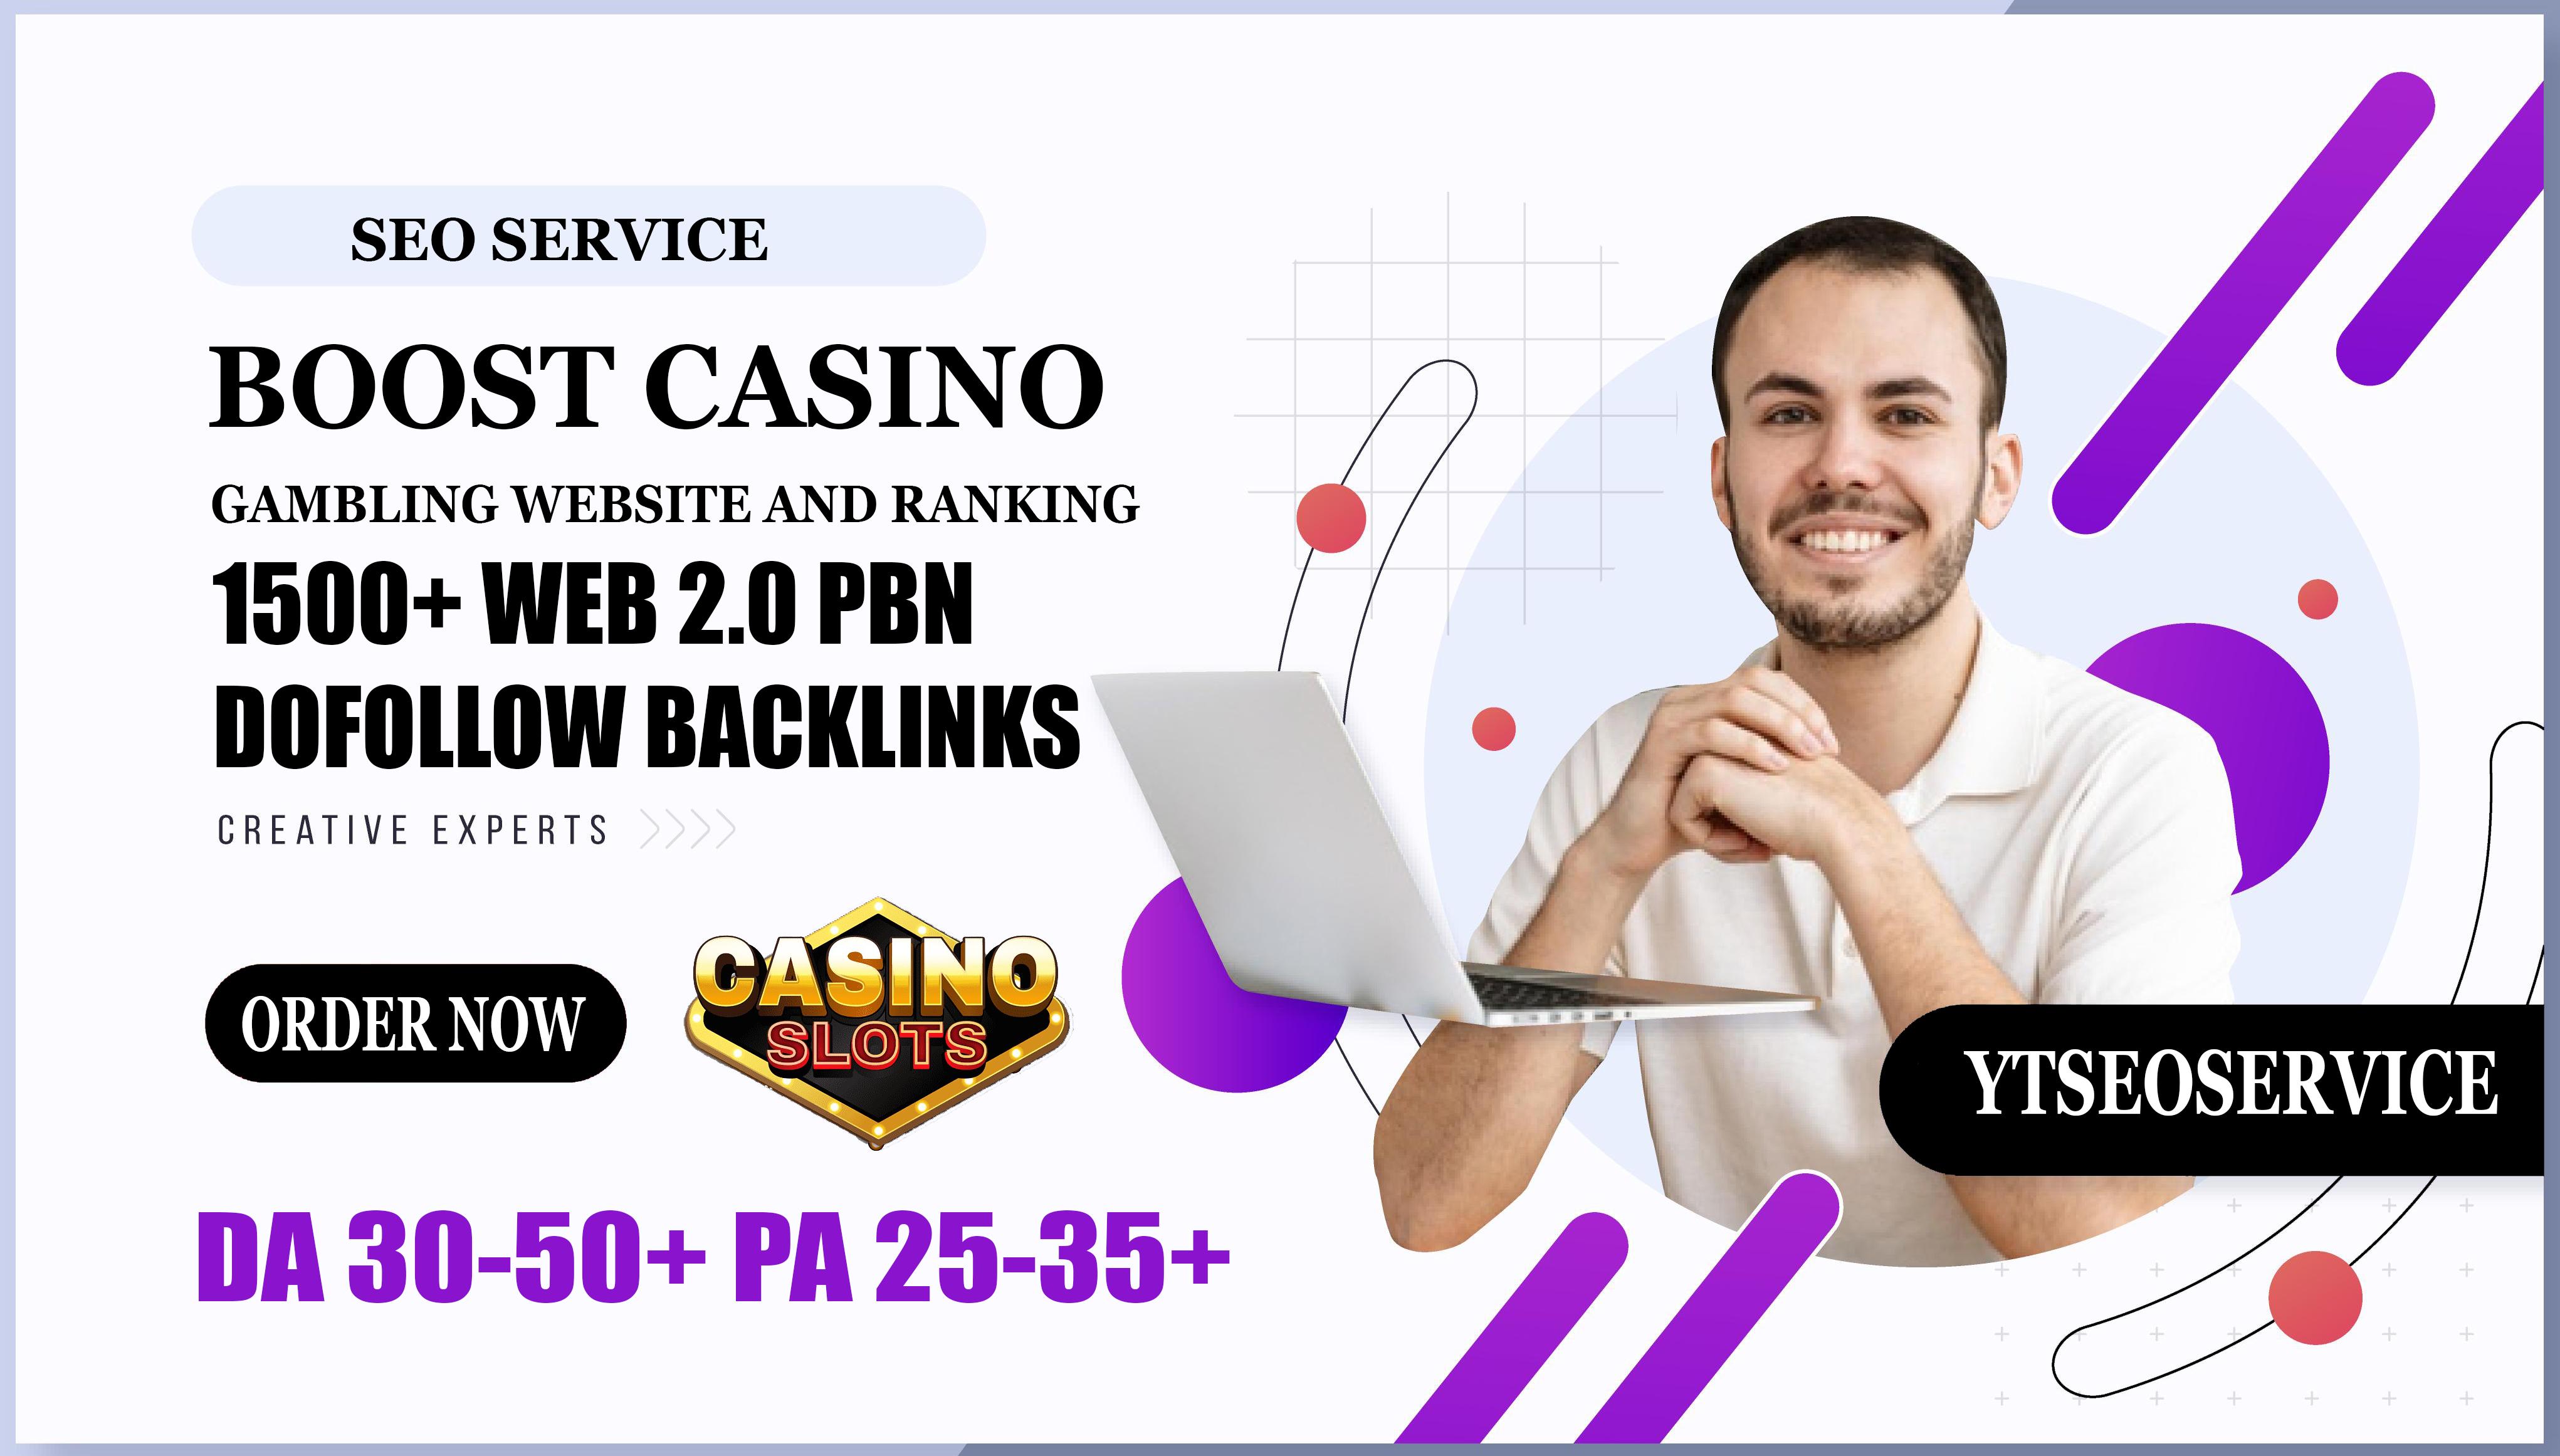 1500+ Web 2.0 PBN Dofollow Backlinks Boost Casino Gambling Website And Ranking